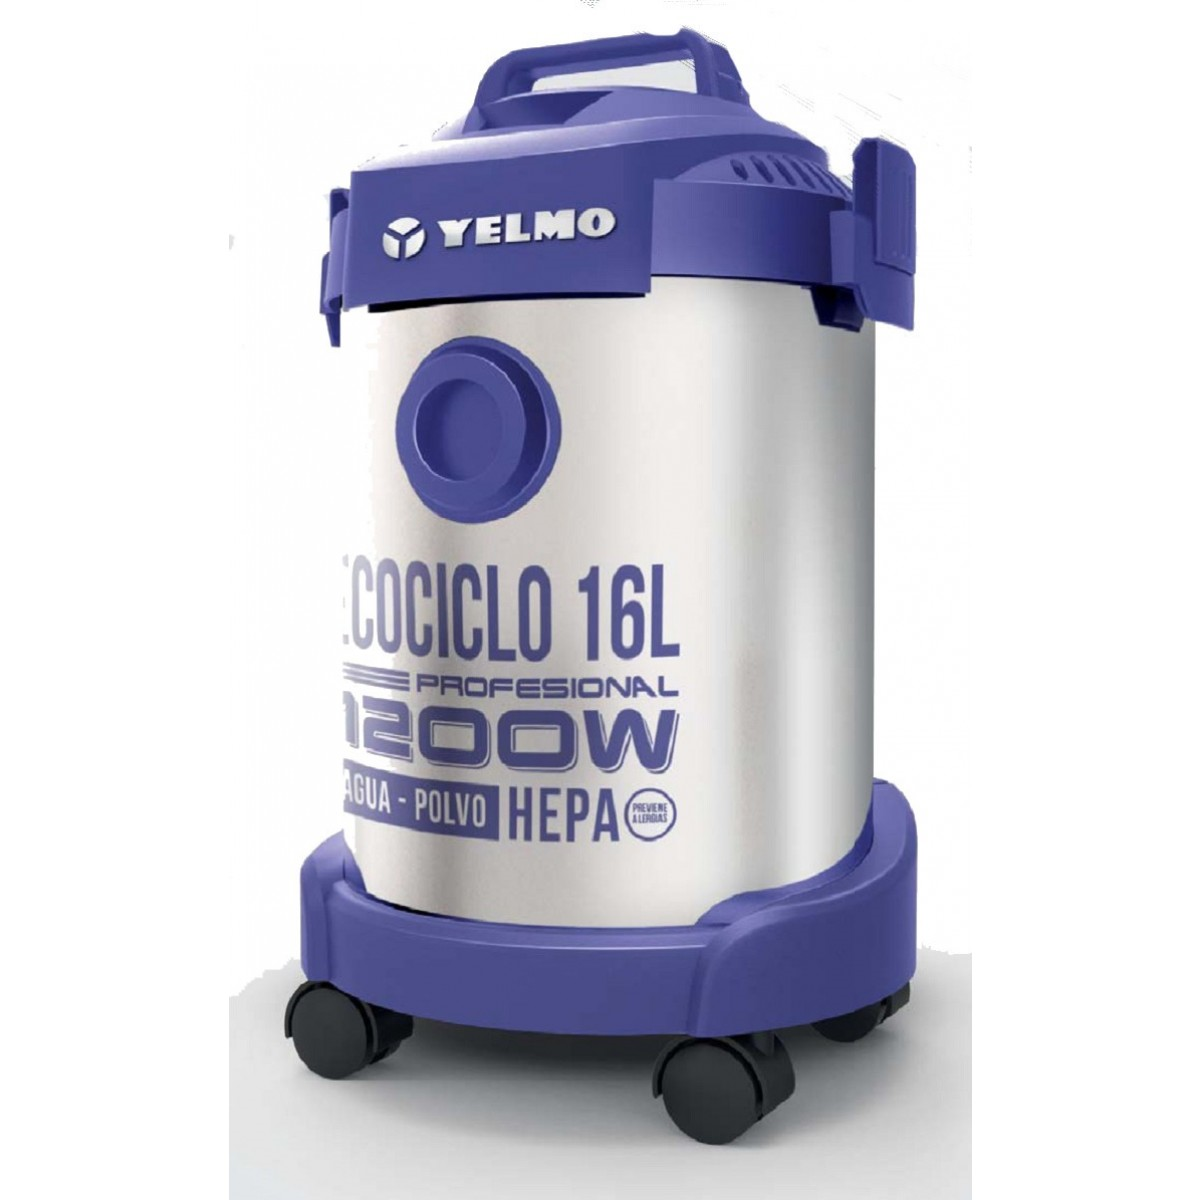 Aspiradora Yelmo As-3314 1200w